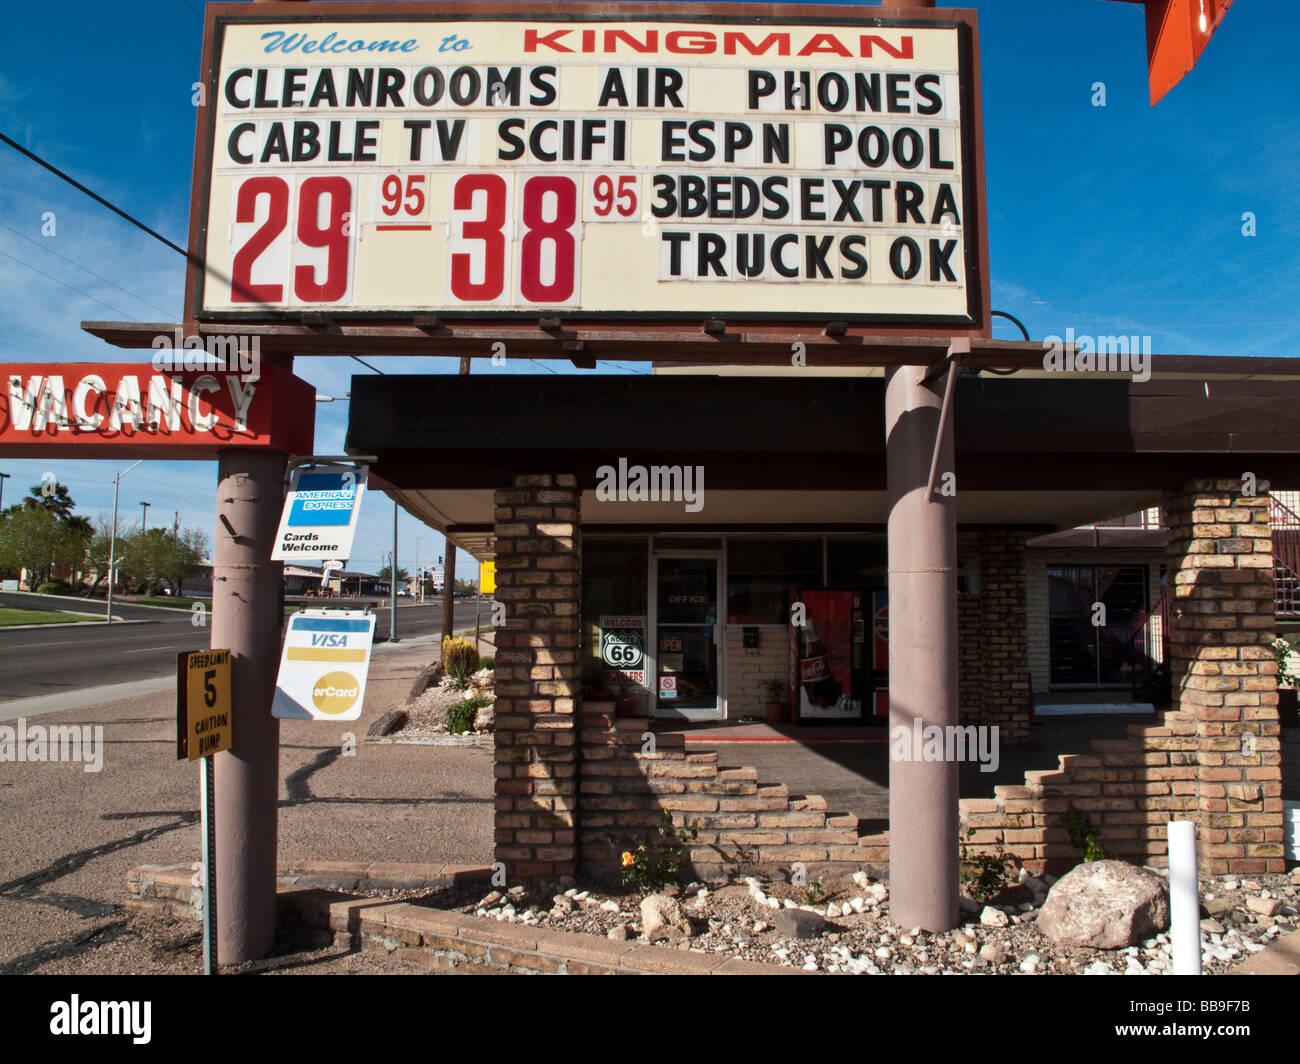 Motel, Kingman, Arizona - Stock Image